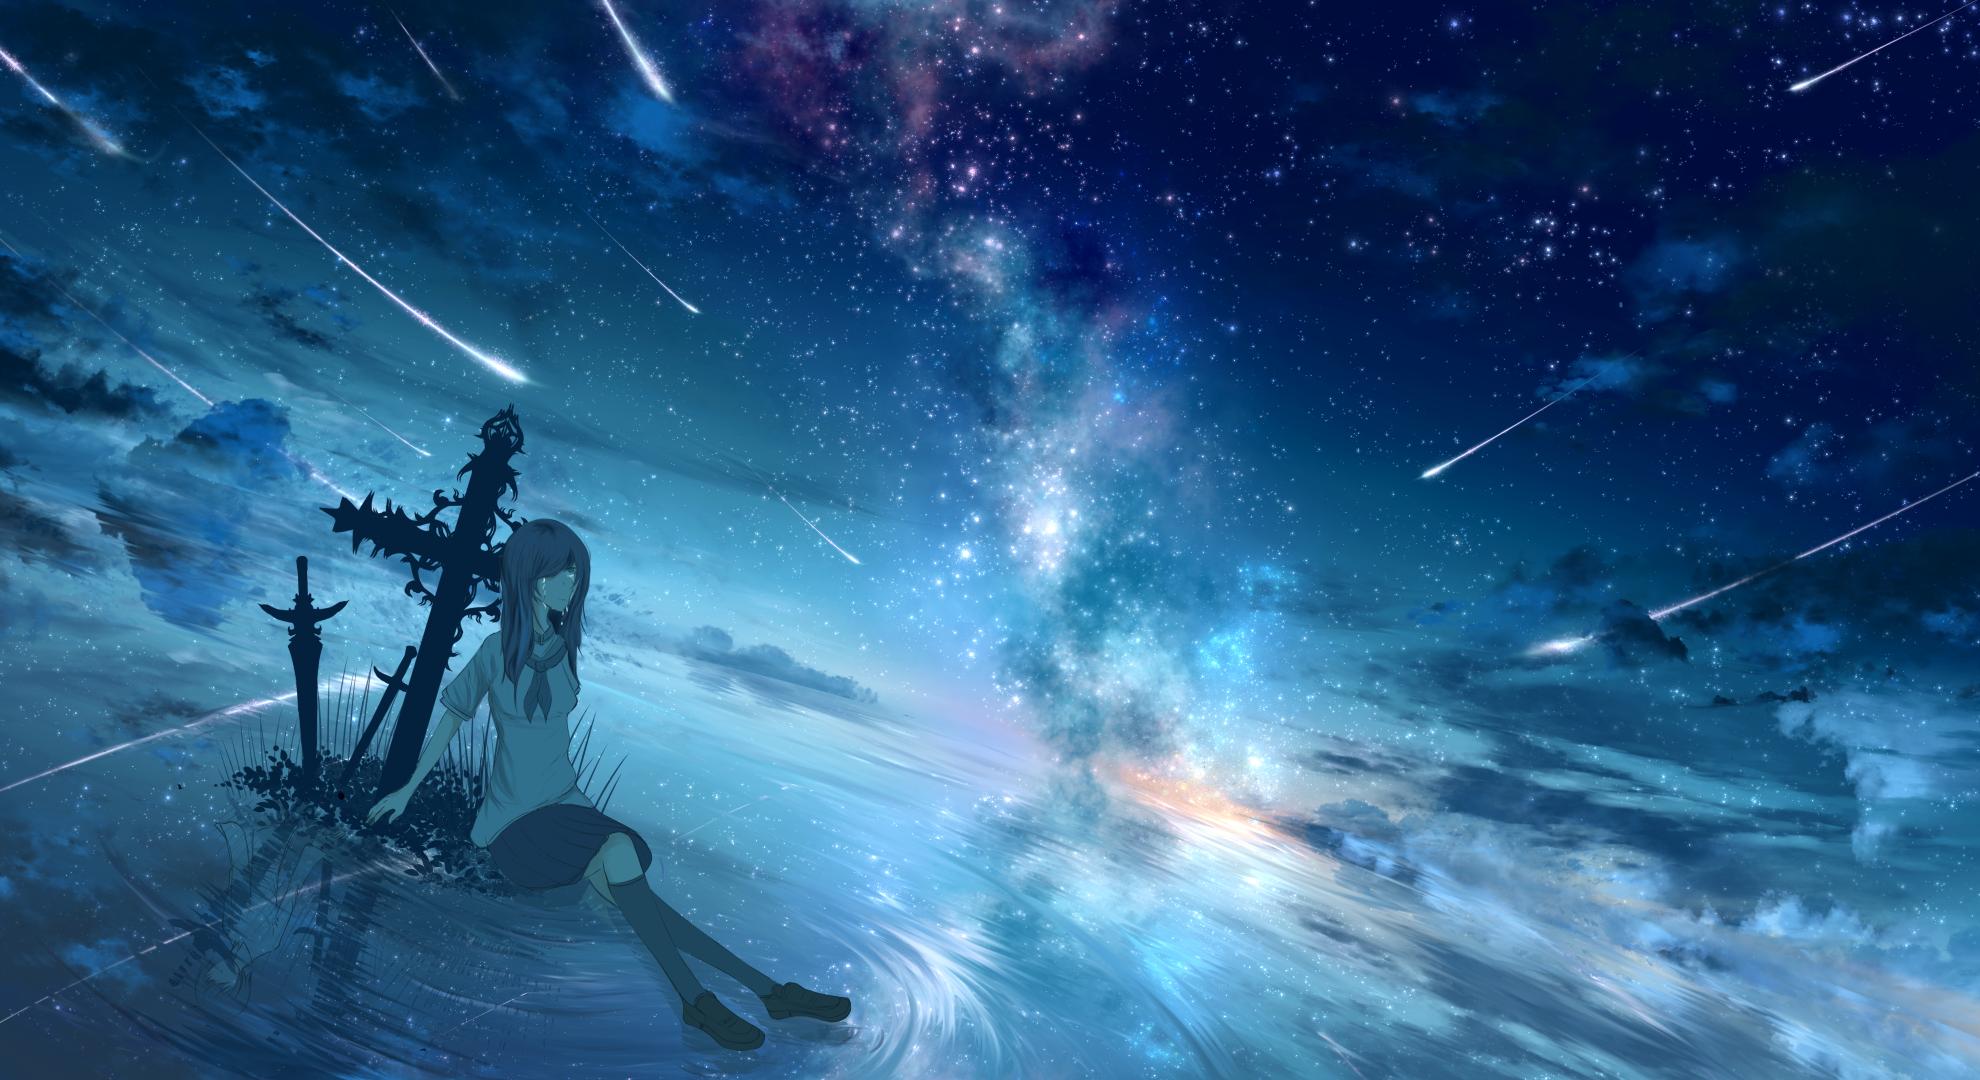 Girl Starry Sky Wallpaper   Resolution1980x1080   ID1057937 1980x1080